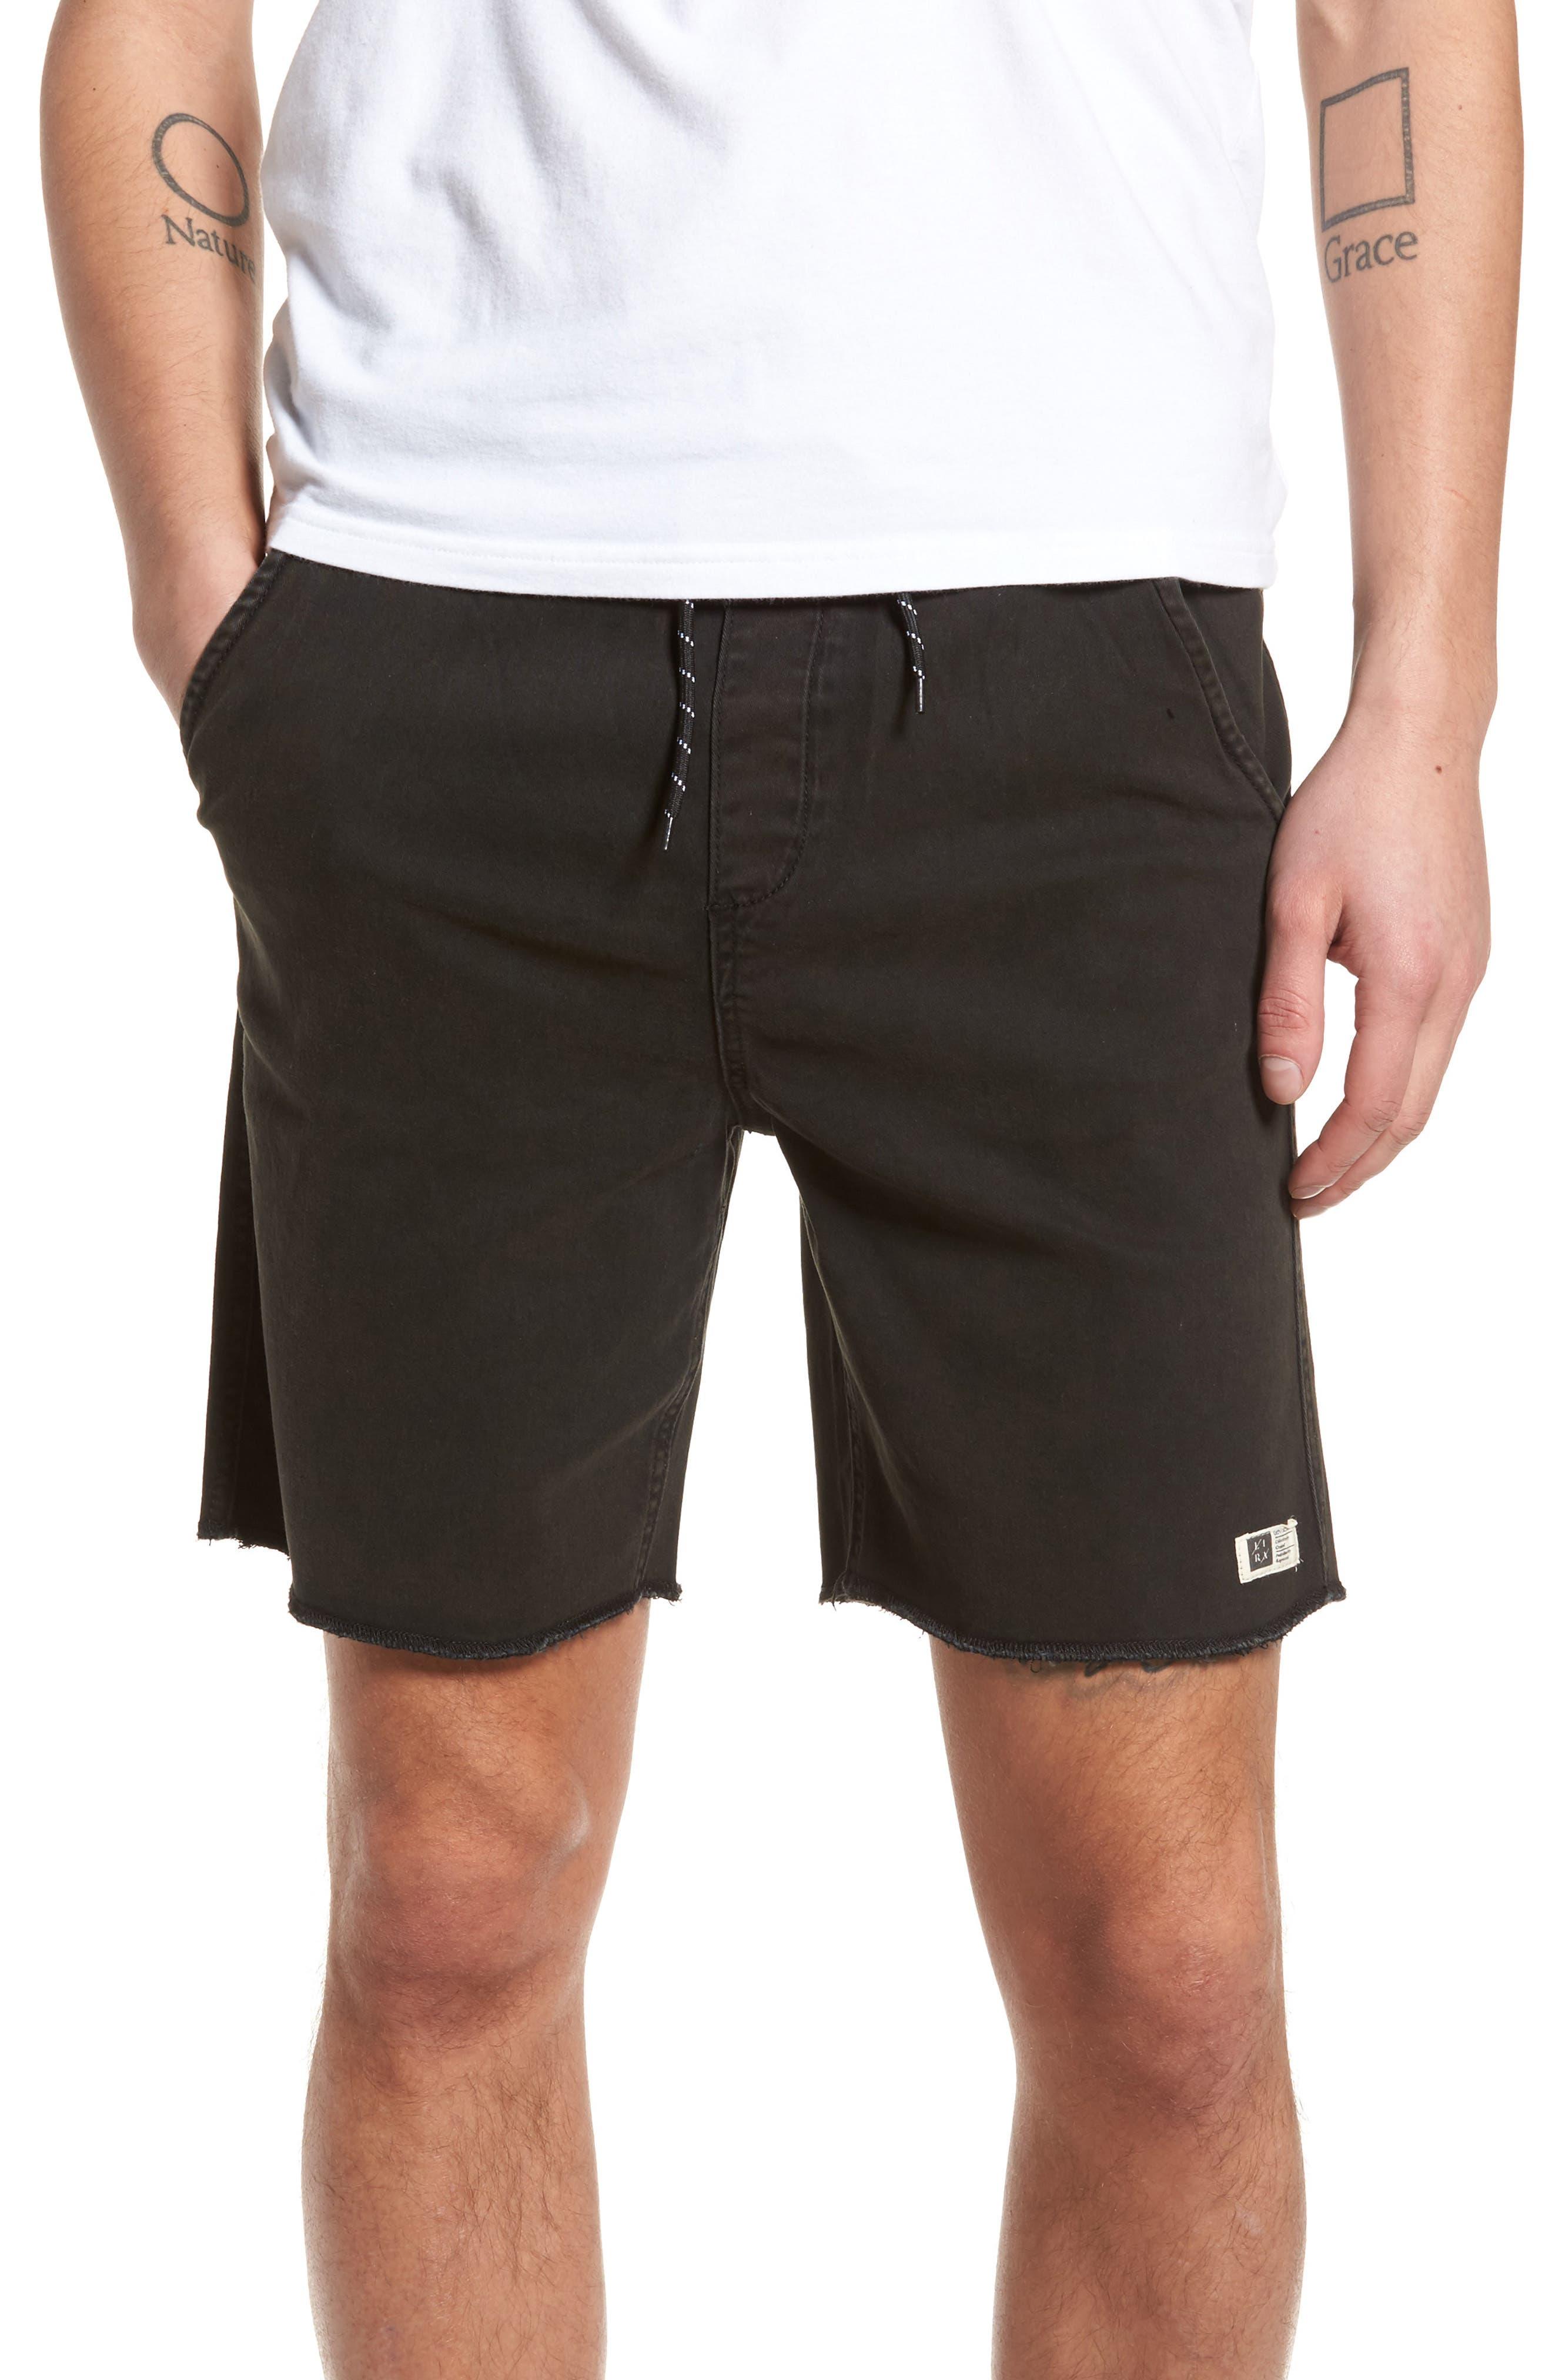 Main Image - Lira Clothing Frazier Walk Shorts